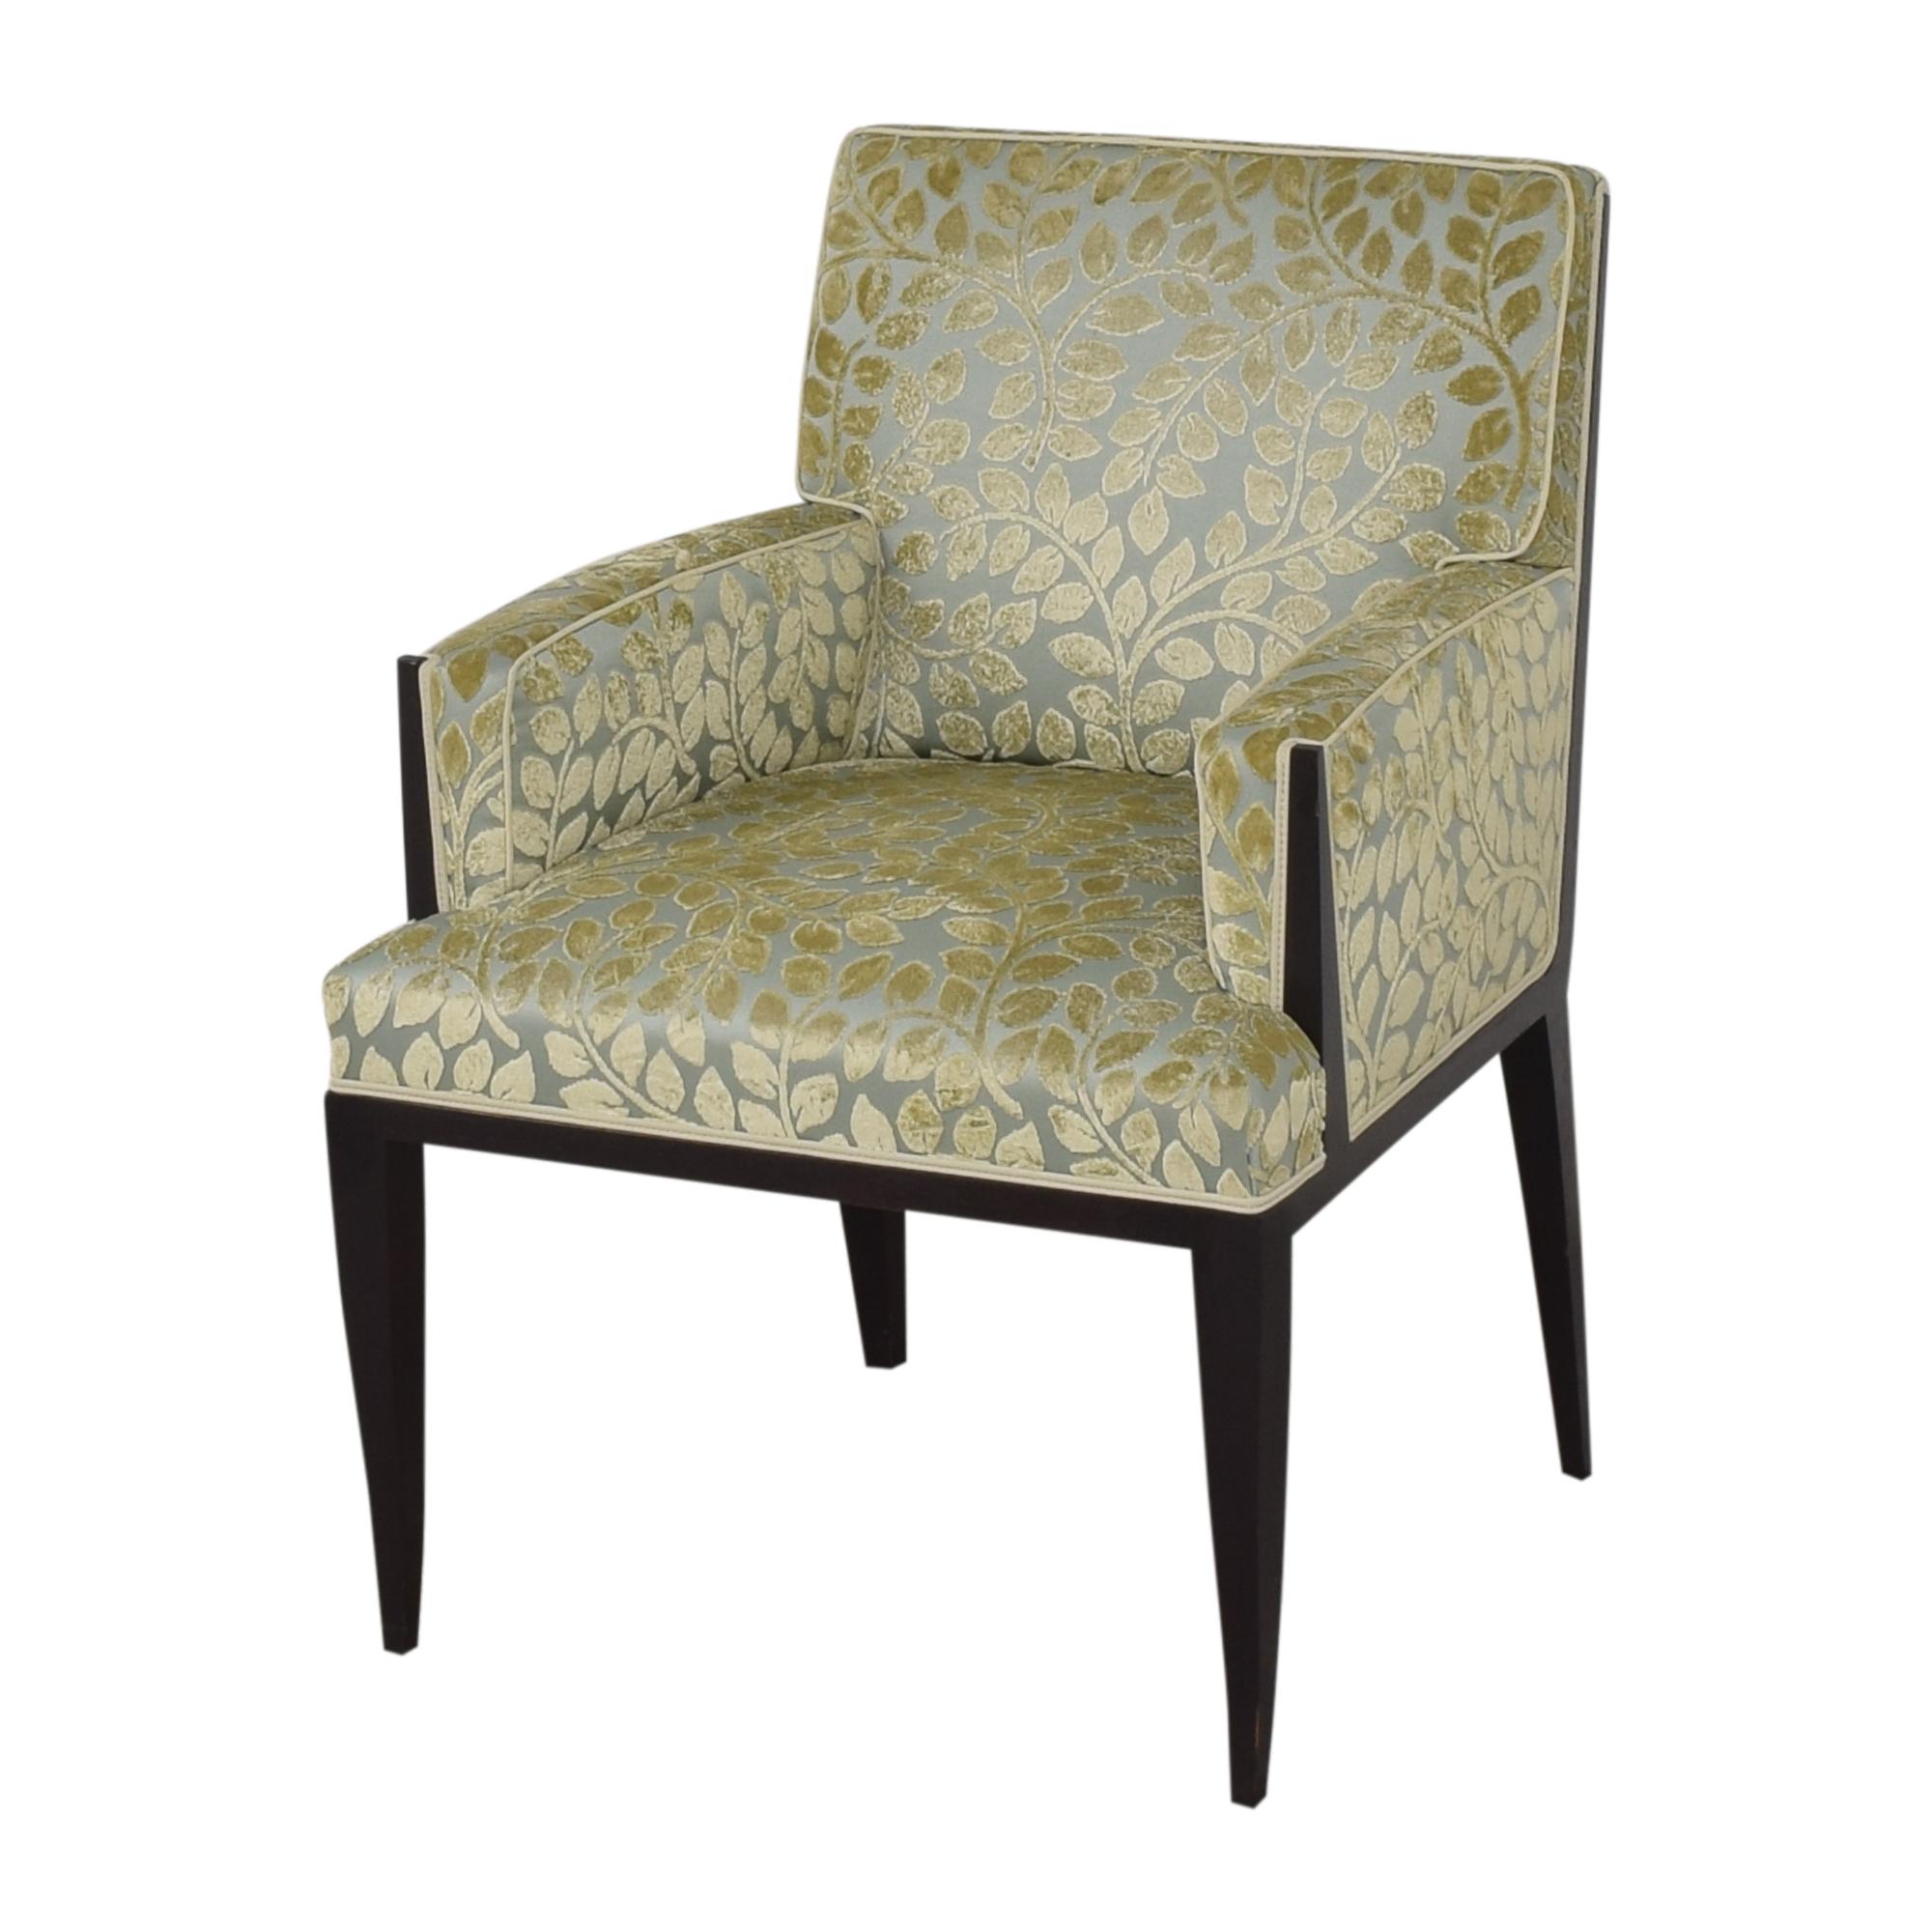 buy Mattaliano Flea Market #1 Dining Arm Chairs Mattaliano Dining Chairs